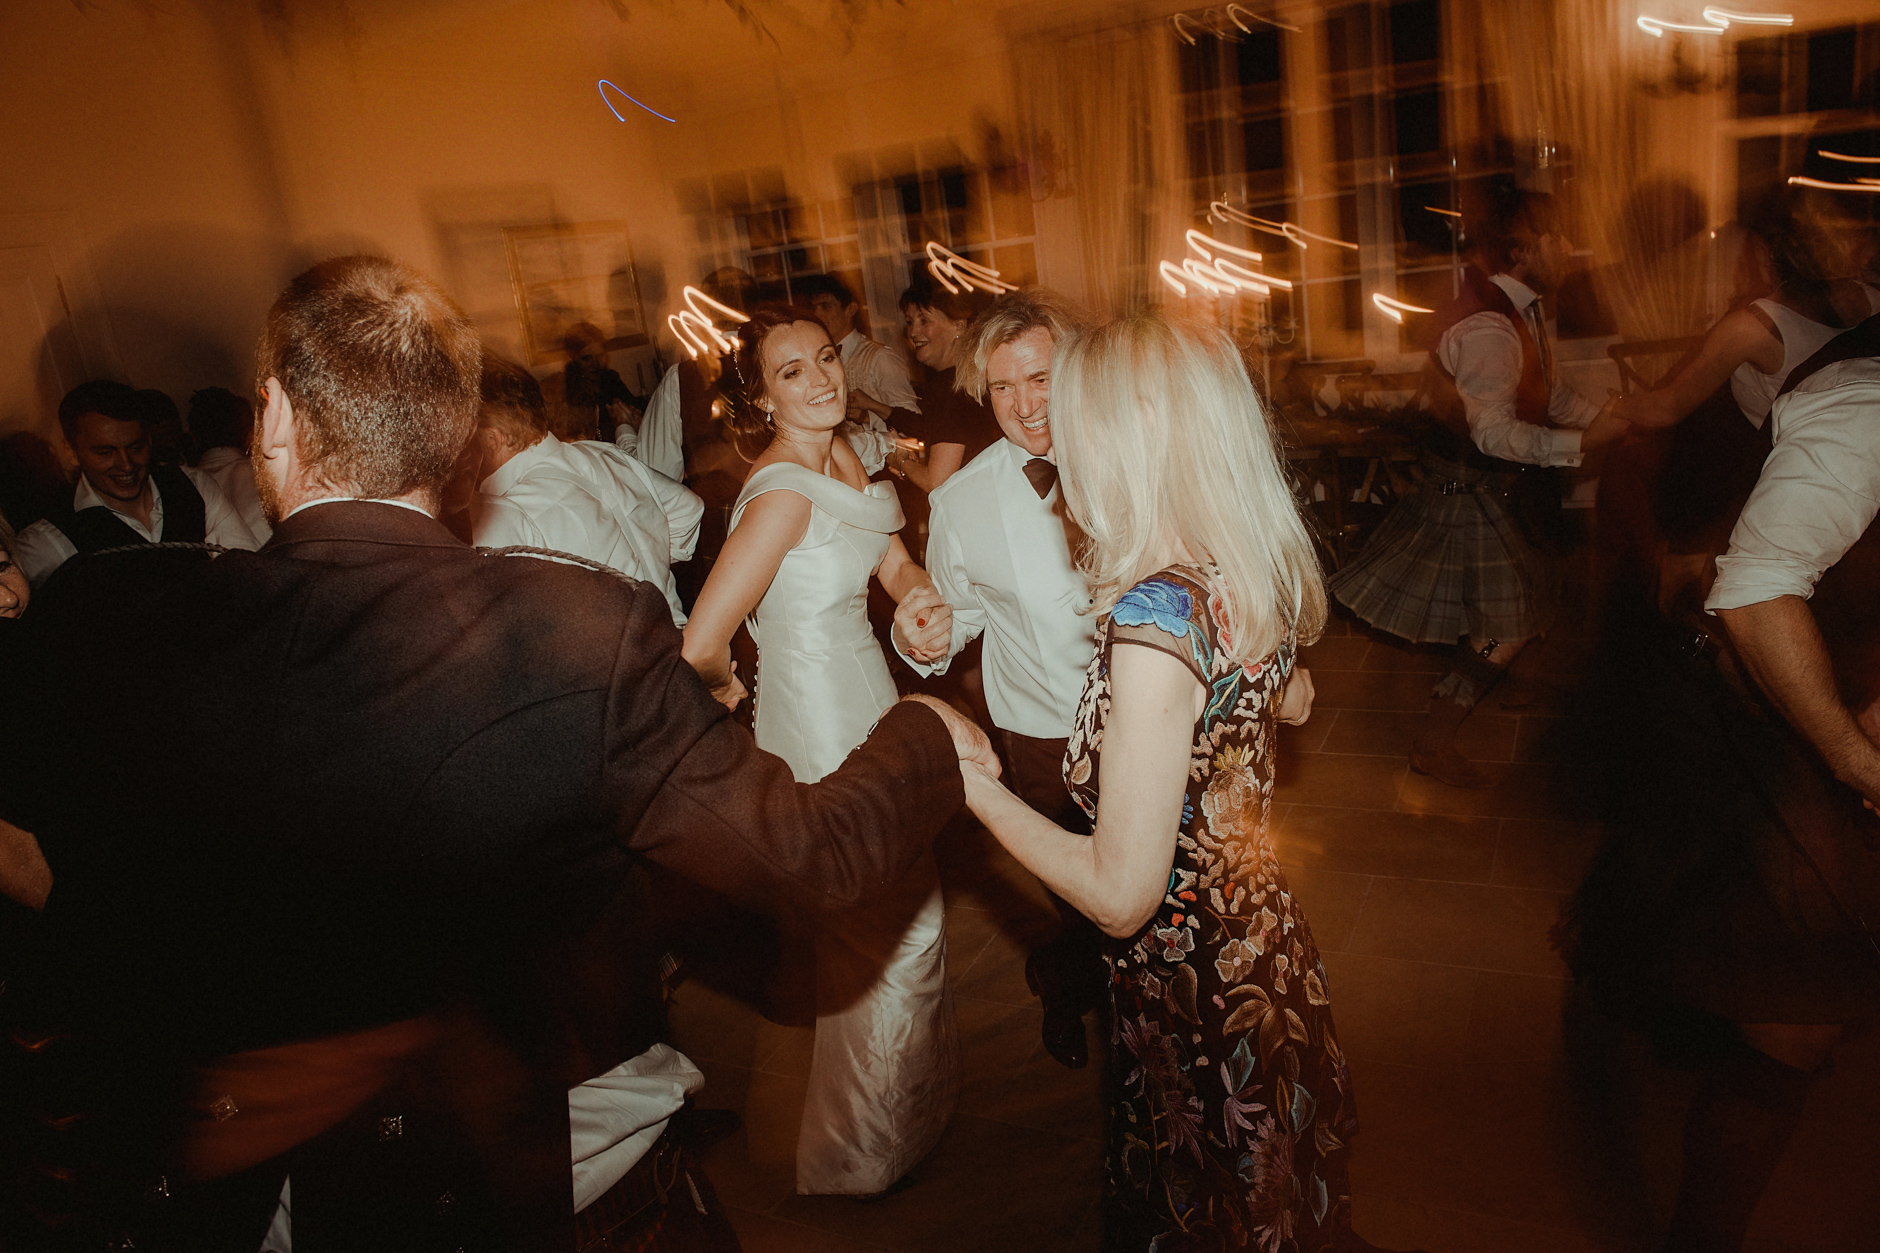 Glentruim-Wedding-Nikki-Leadbetter-Photography-412.jpg